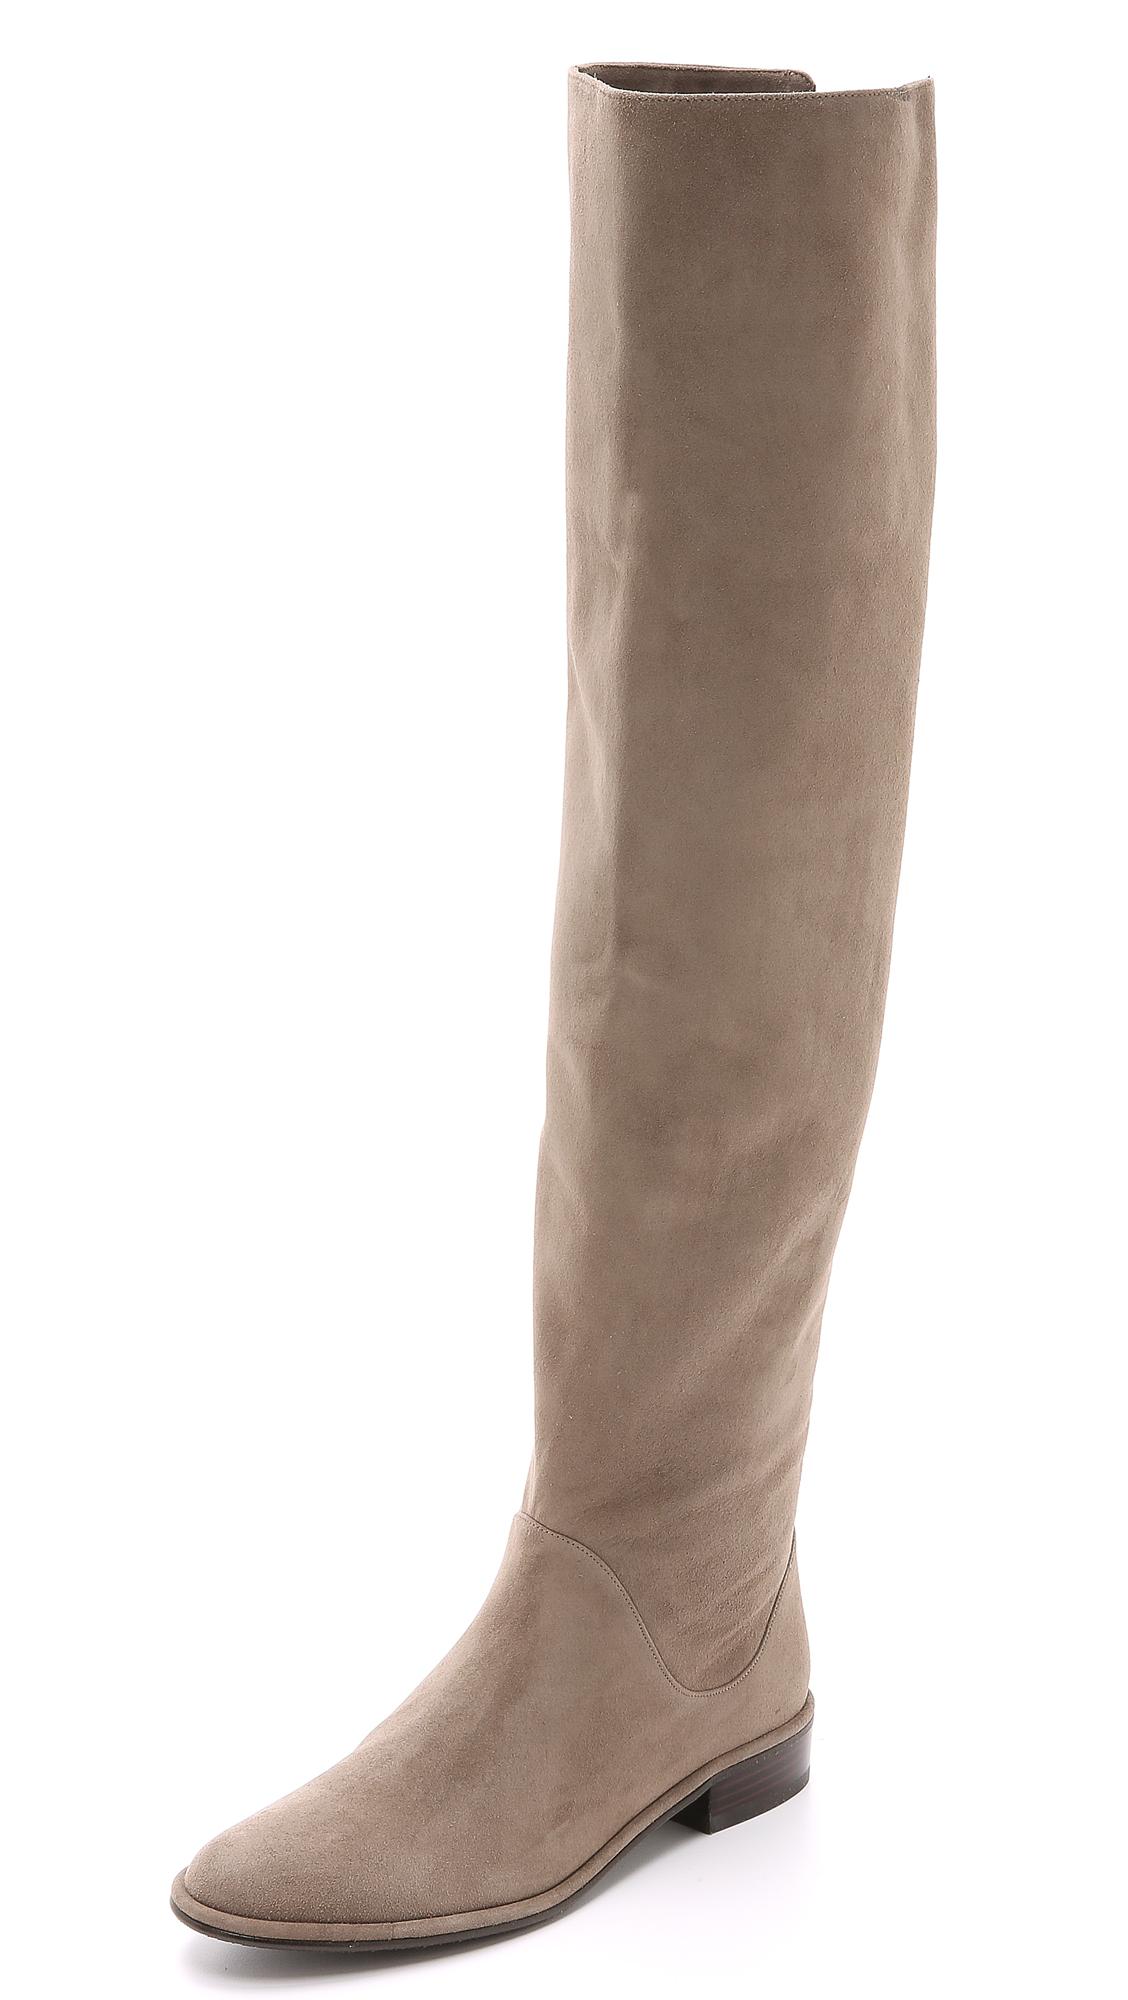 Stuart Weitzman Rocker Chic Suede Boots In Praline